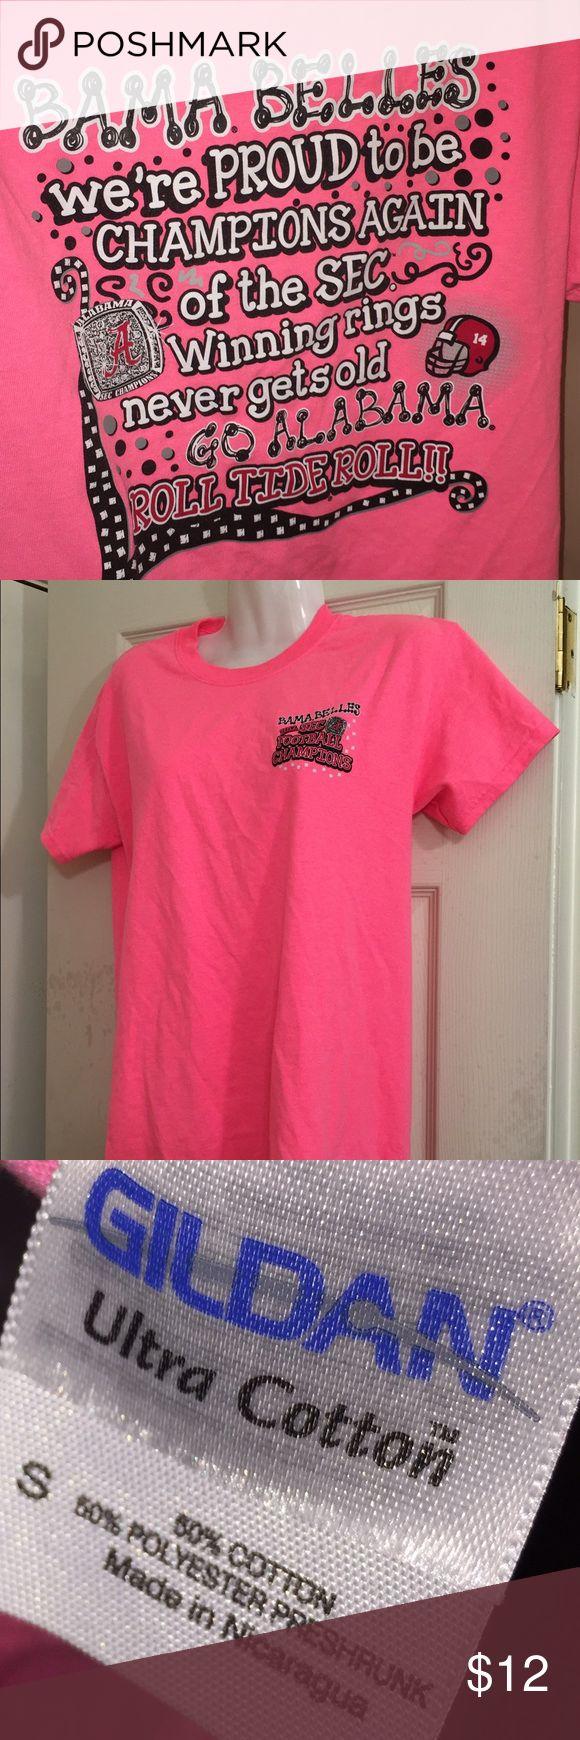 Pink Bama Belles t shirt Small Pink tee shirt celebrating University of Alabama 2012 SEC football  championship win. Great used condition. Small cotton women's shirt. Tops